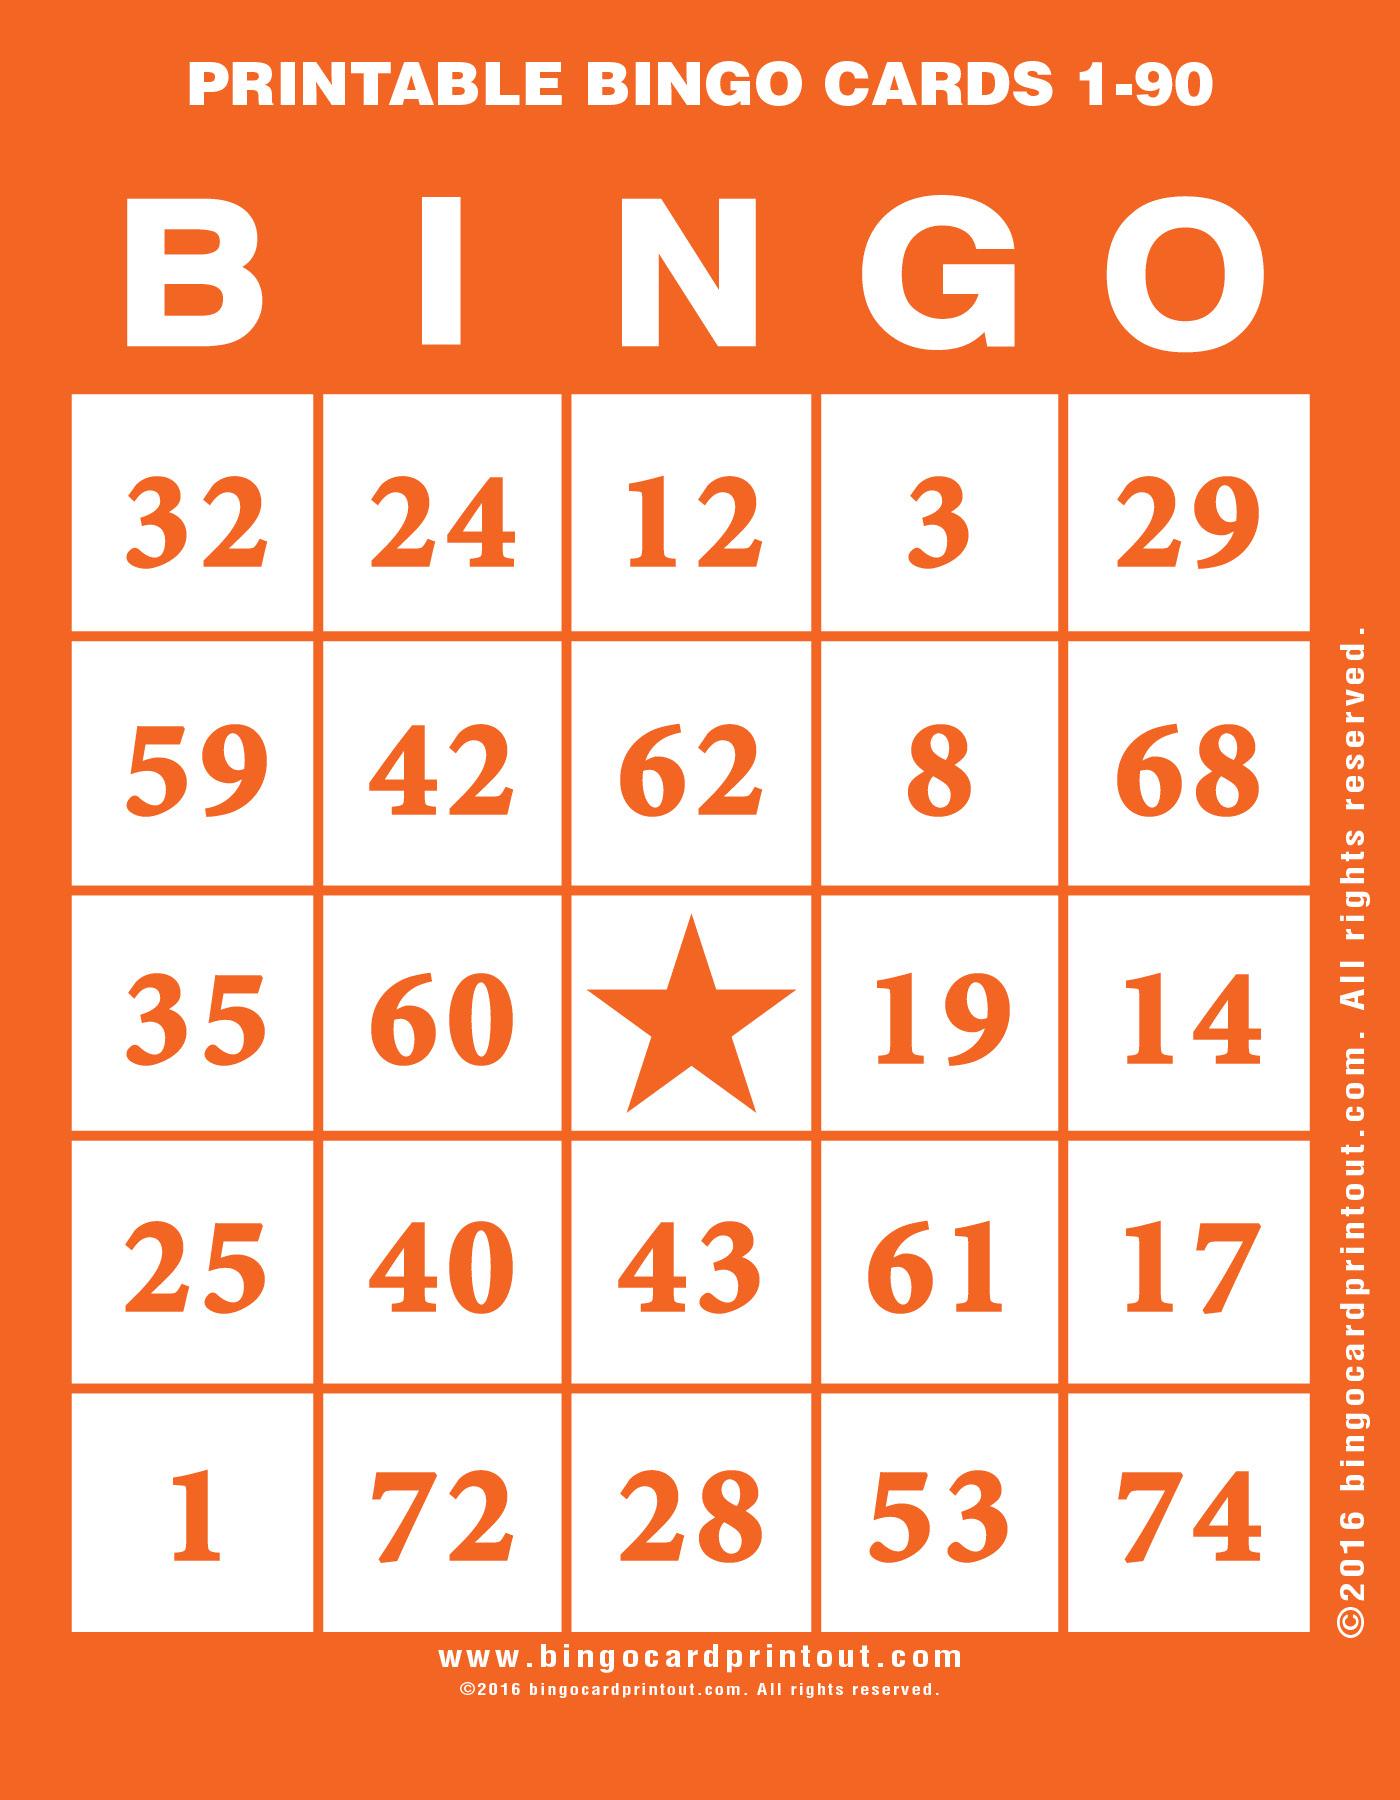 Printable Bingo Cards 1-90 - Bingocardprintout - Free Printable Bingo Cards With Numbers